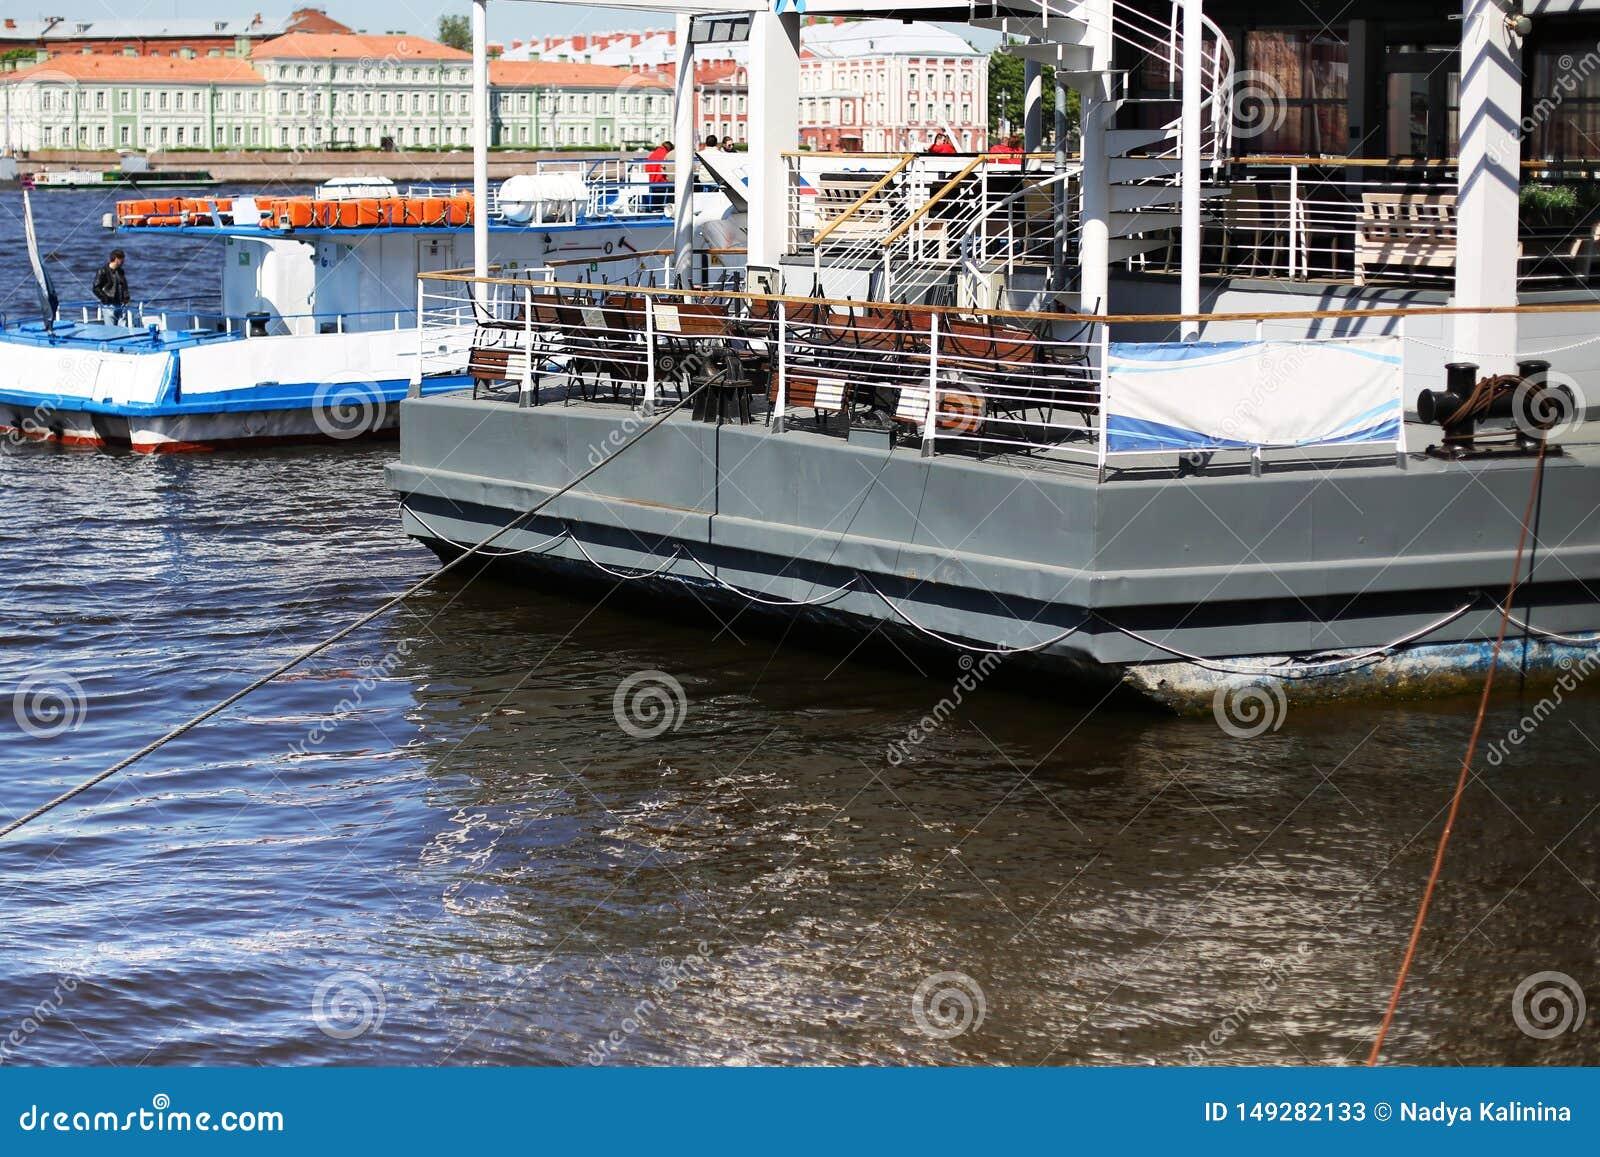 Skeppet i porten v?ntar p? landning